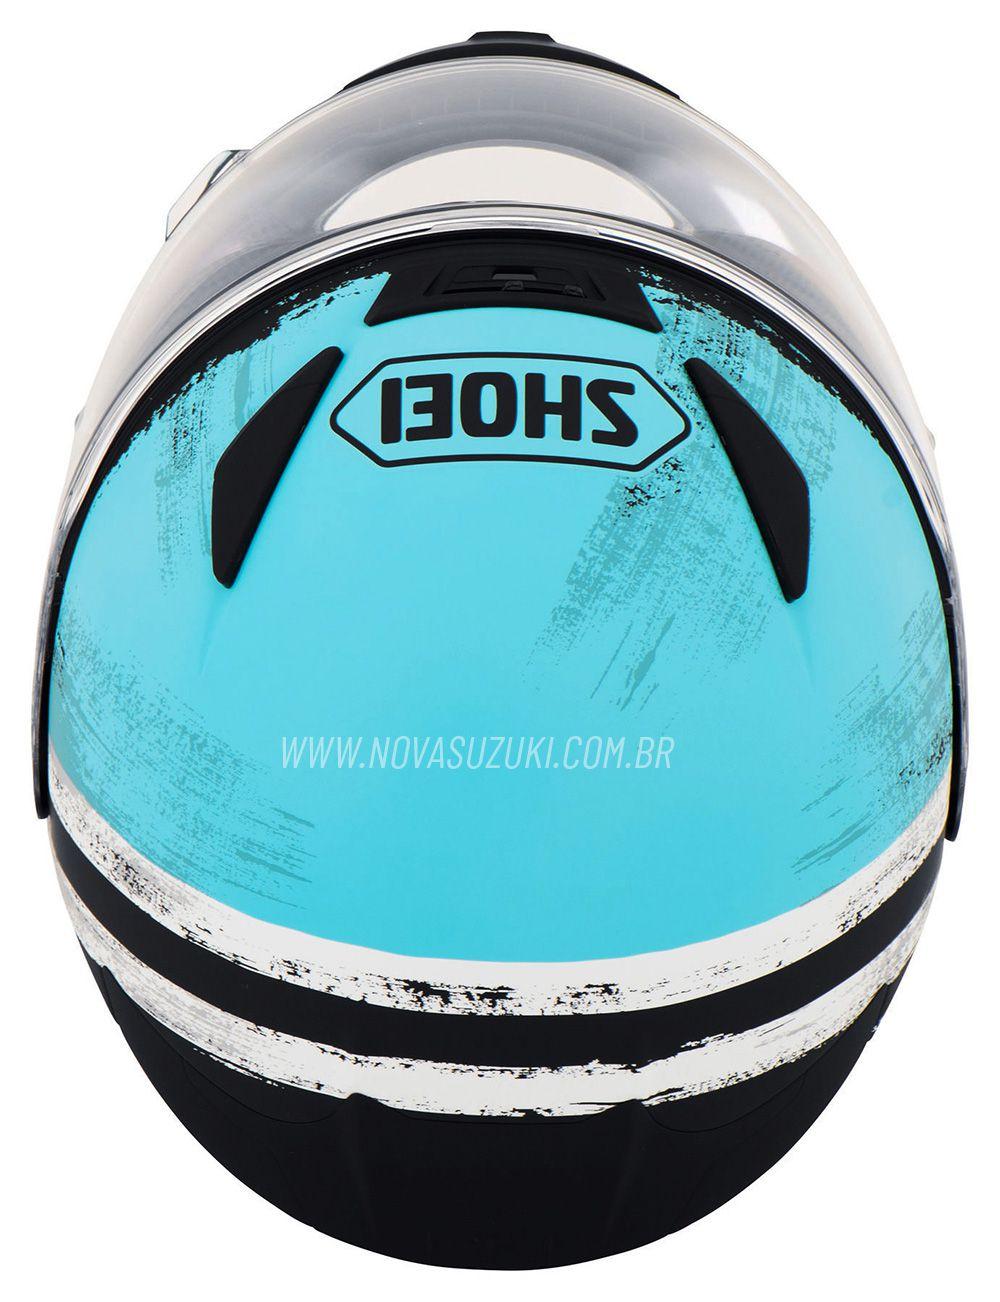 Capacete Shoei NXR Shorebreak Tc-2 Azul Claro para Esportivas - Lançamento  - Nova Suzuki Motos e Acessórios